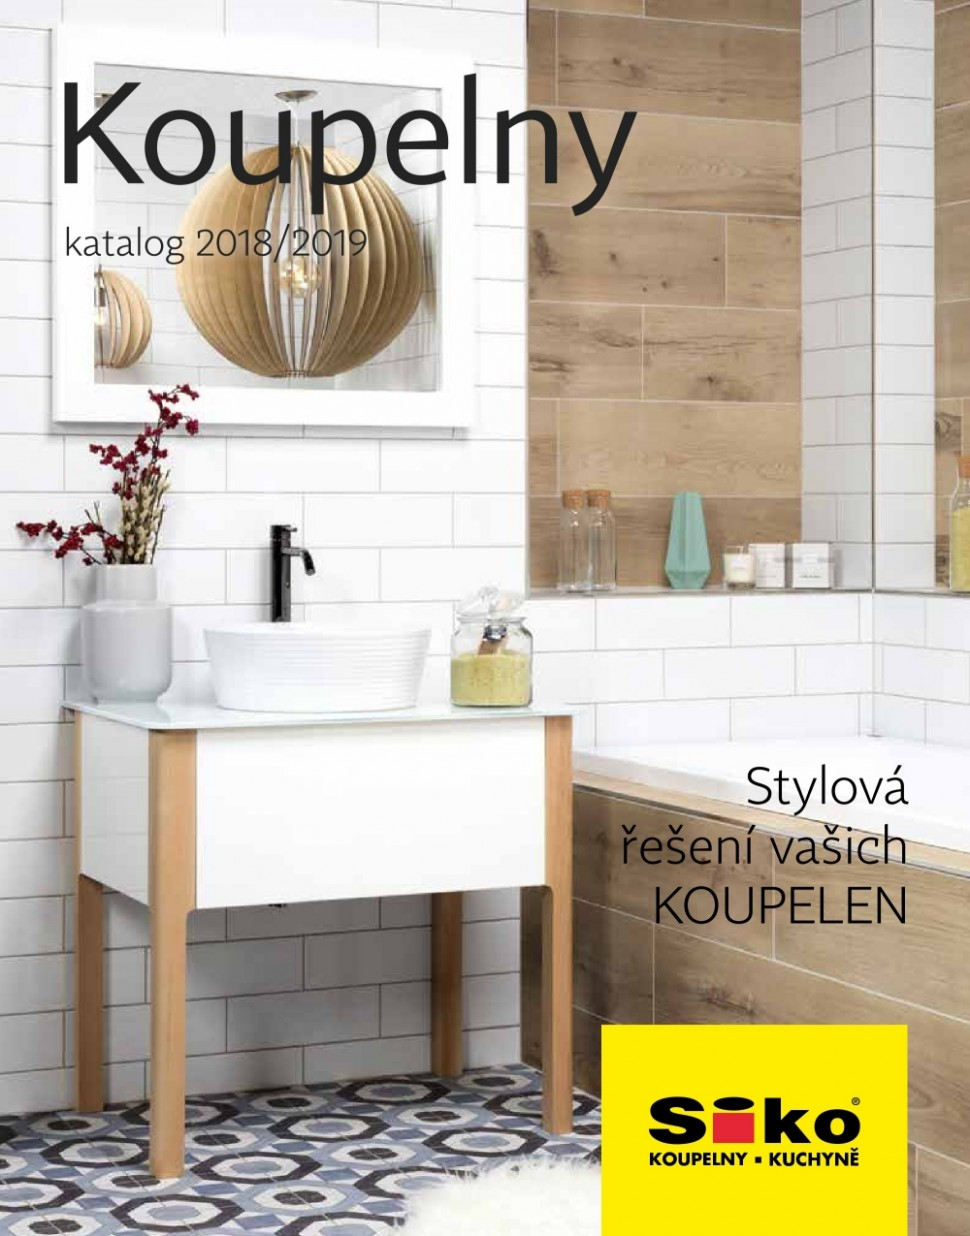 Siko Koupelny katalog 20/20 od 20. 2020. | Kupi.cz